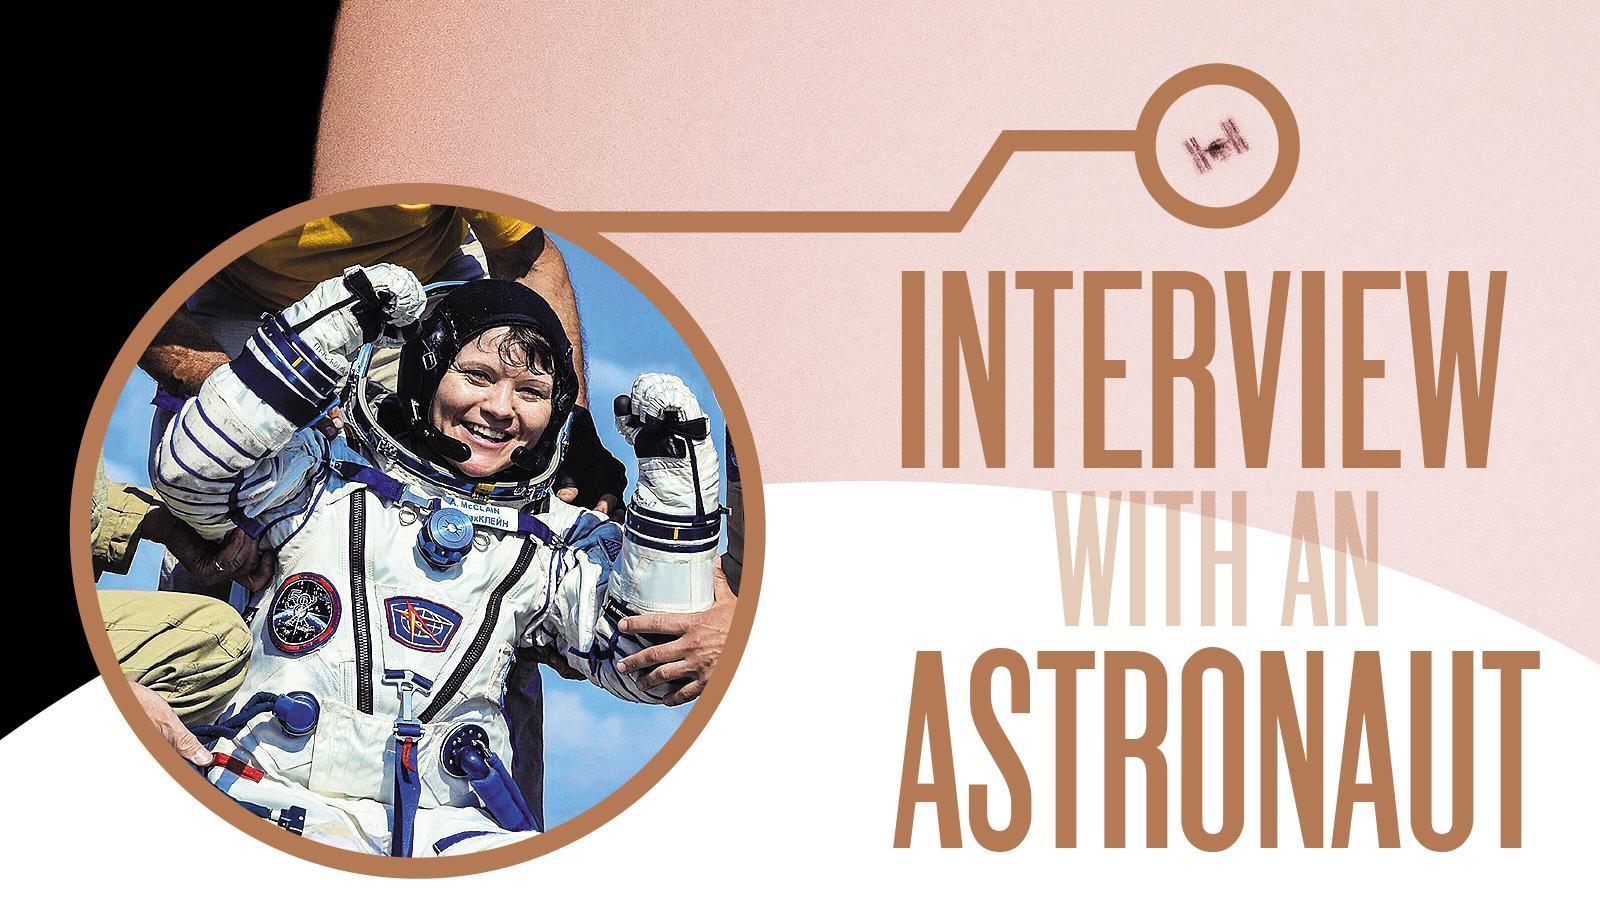 Nasa Astronaut Spokane Native Anne Mcclain Returns To Earth